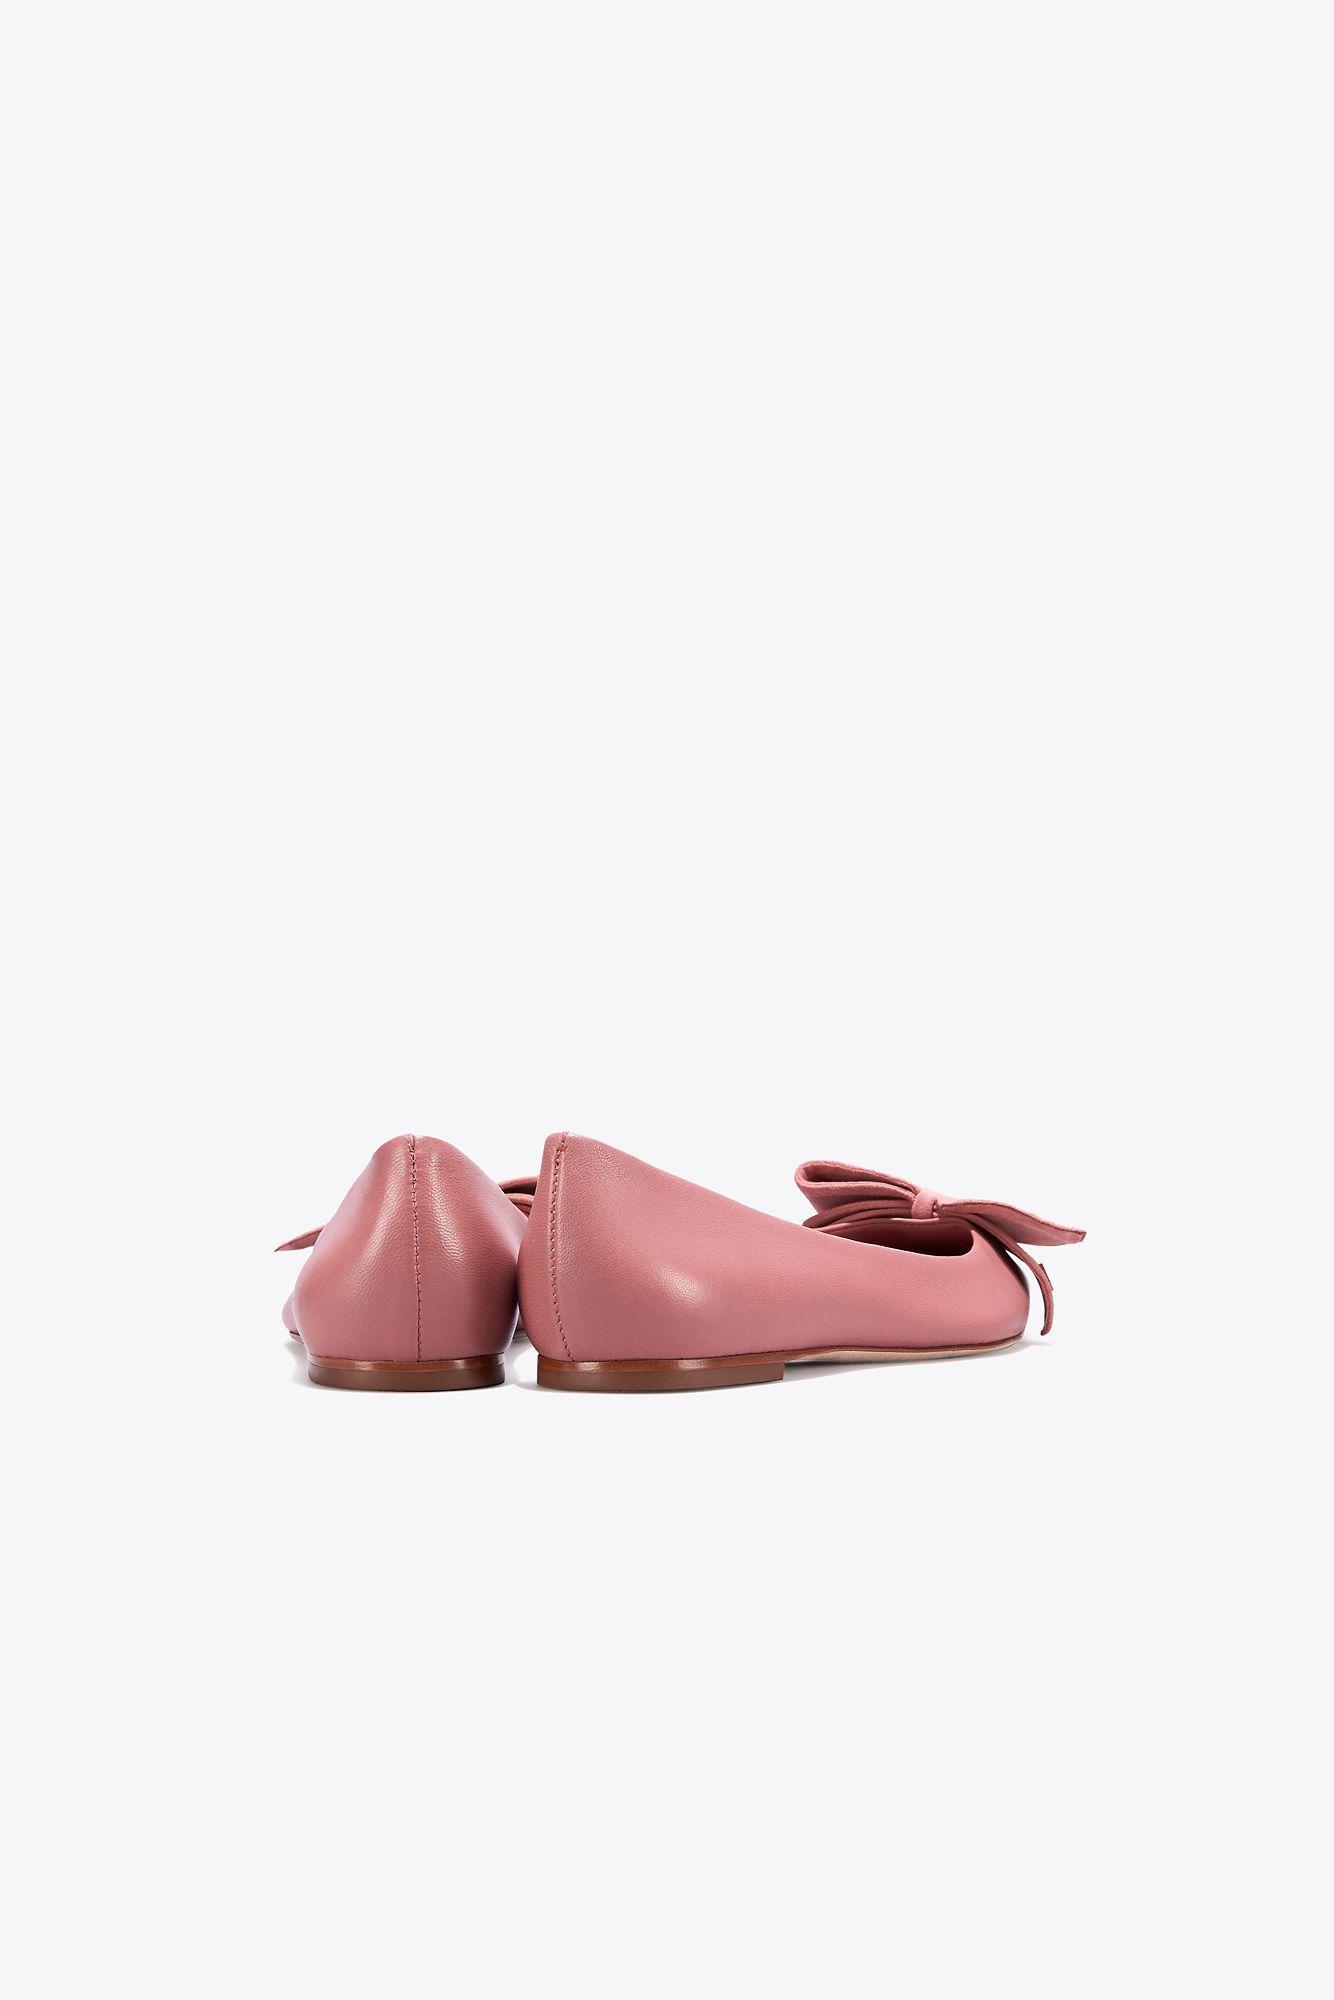 5e8e410ac Tory Burch Rosalind Ballet Flat   651   Skimmers in Pink - Lyst